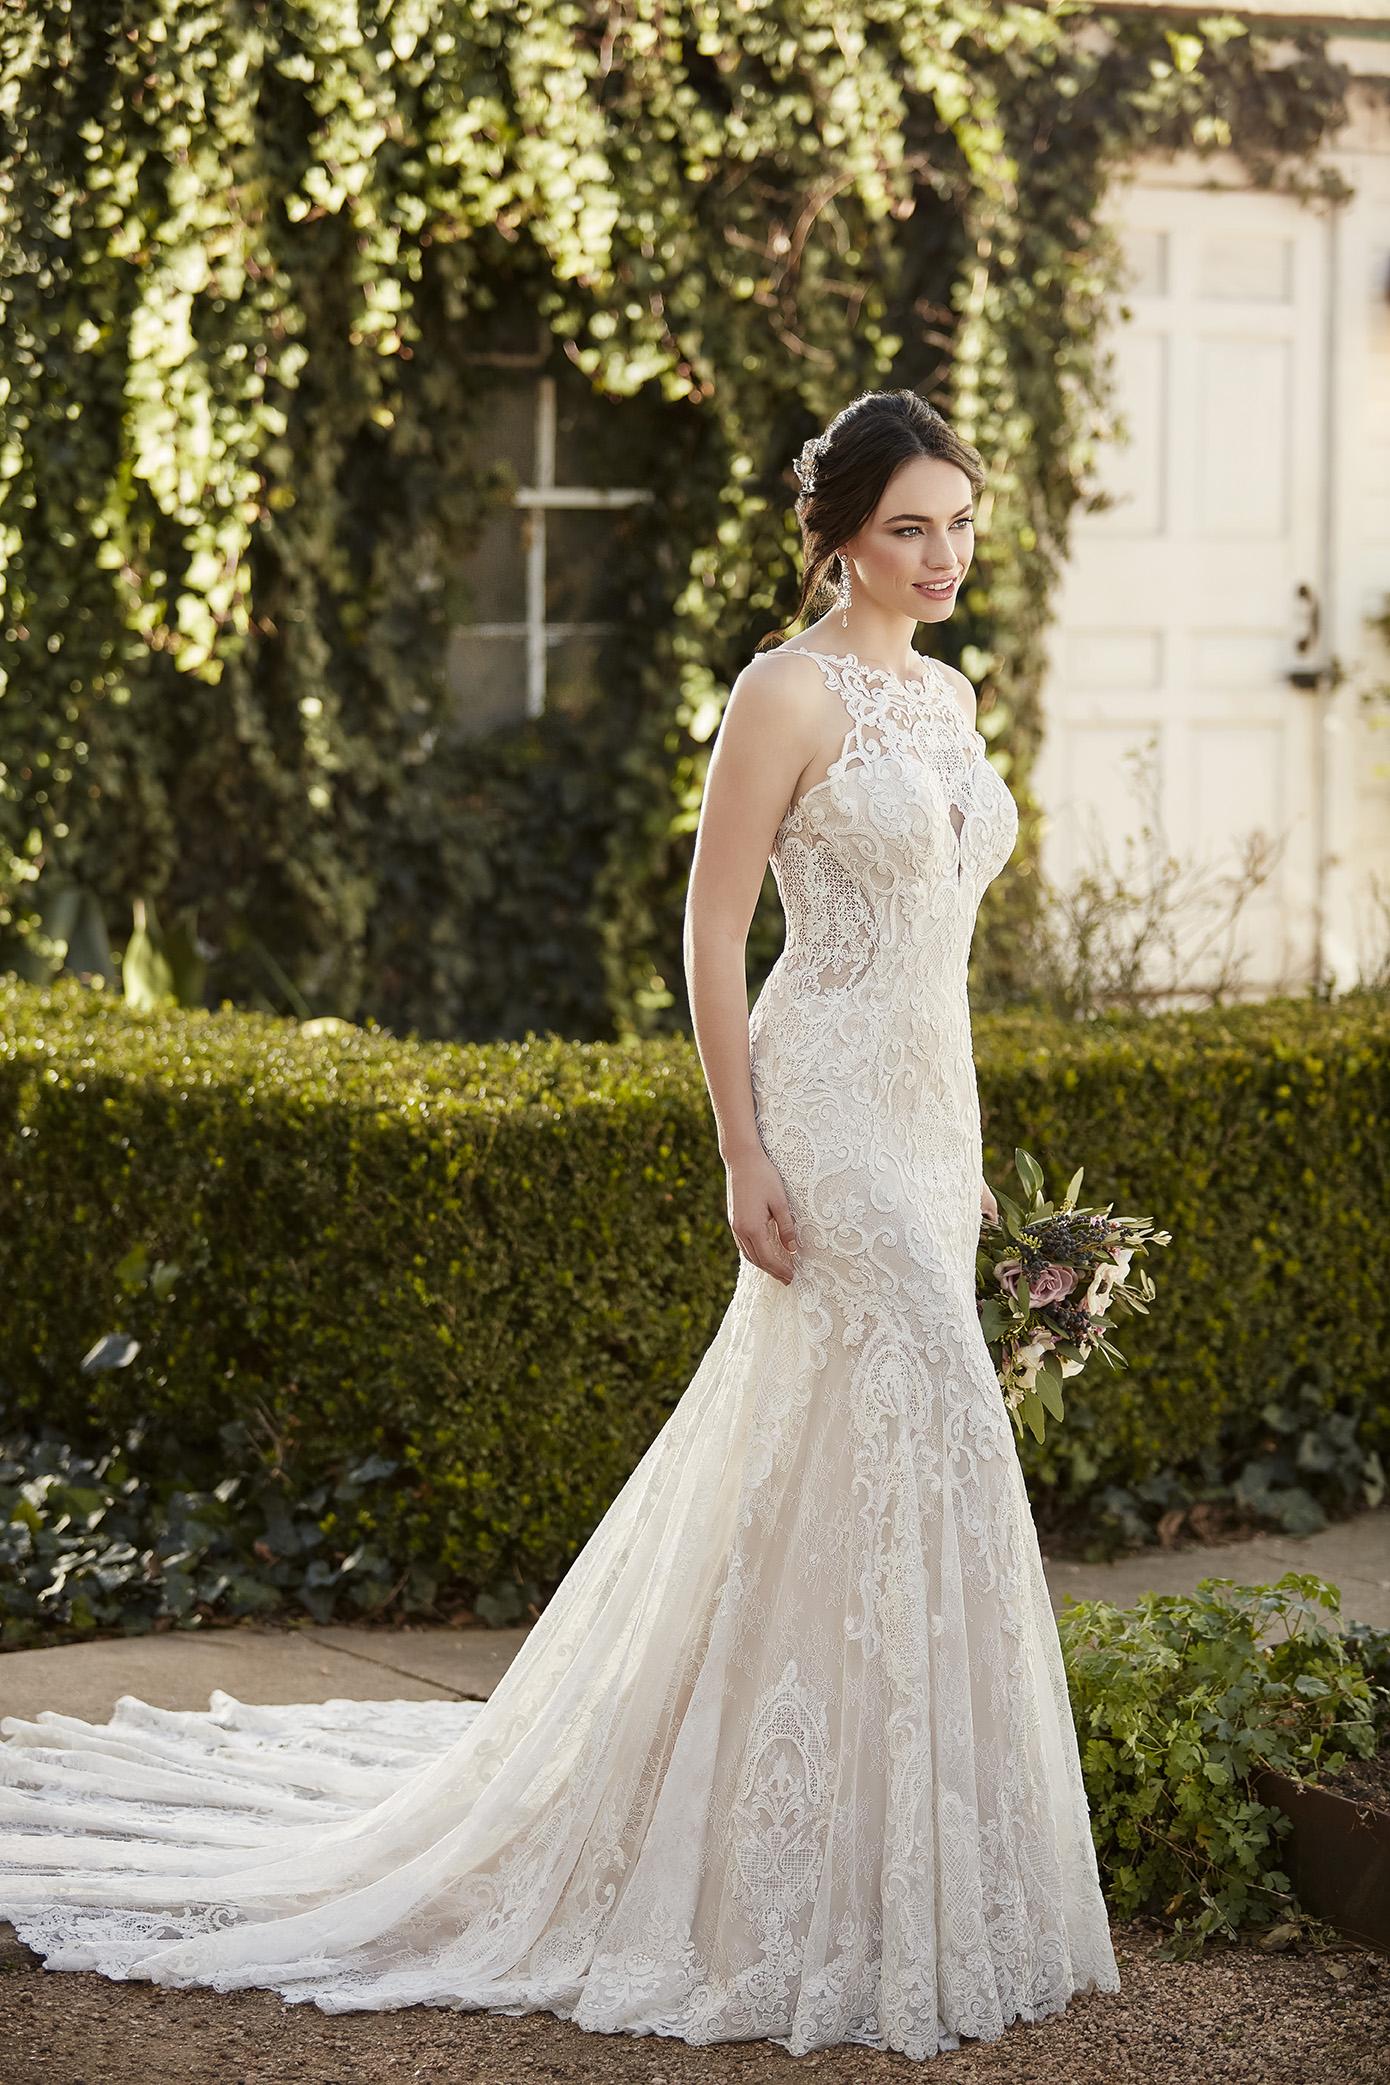 Wedding Dress Designer Martina Liana Launches Fall 2017